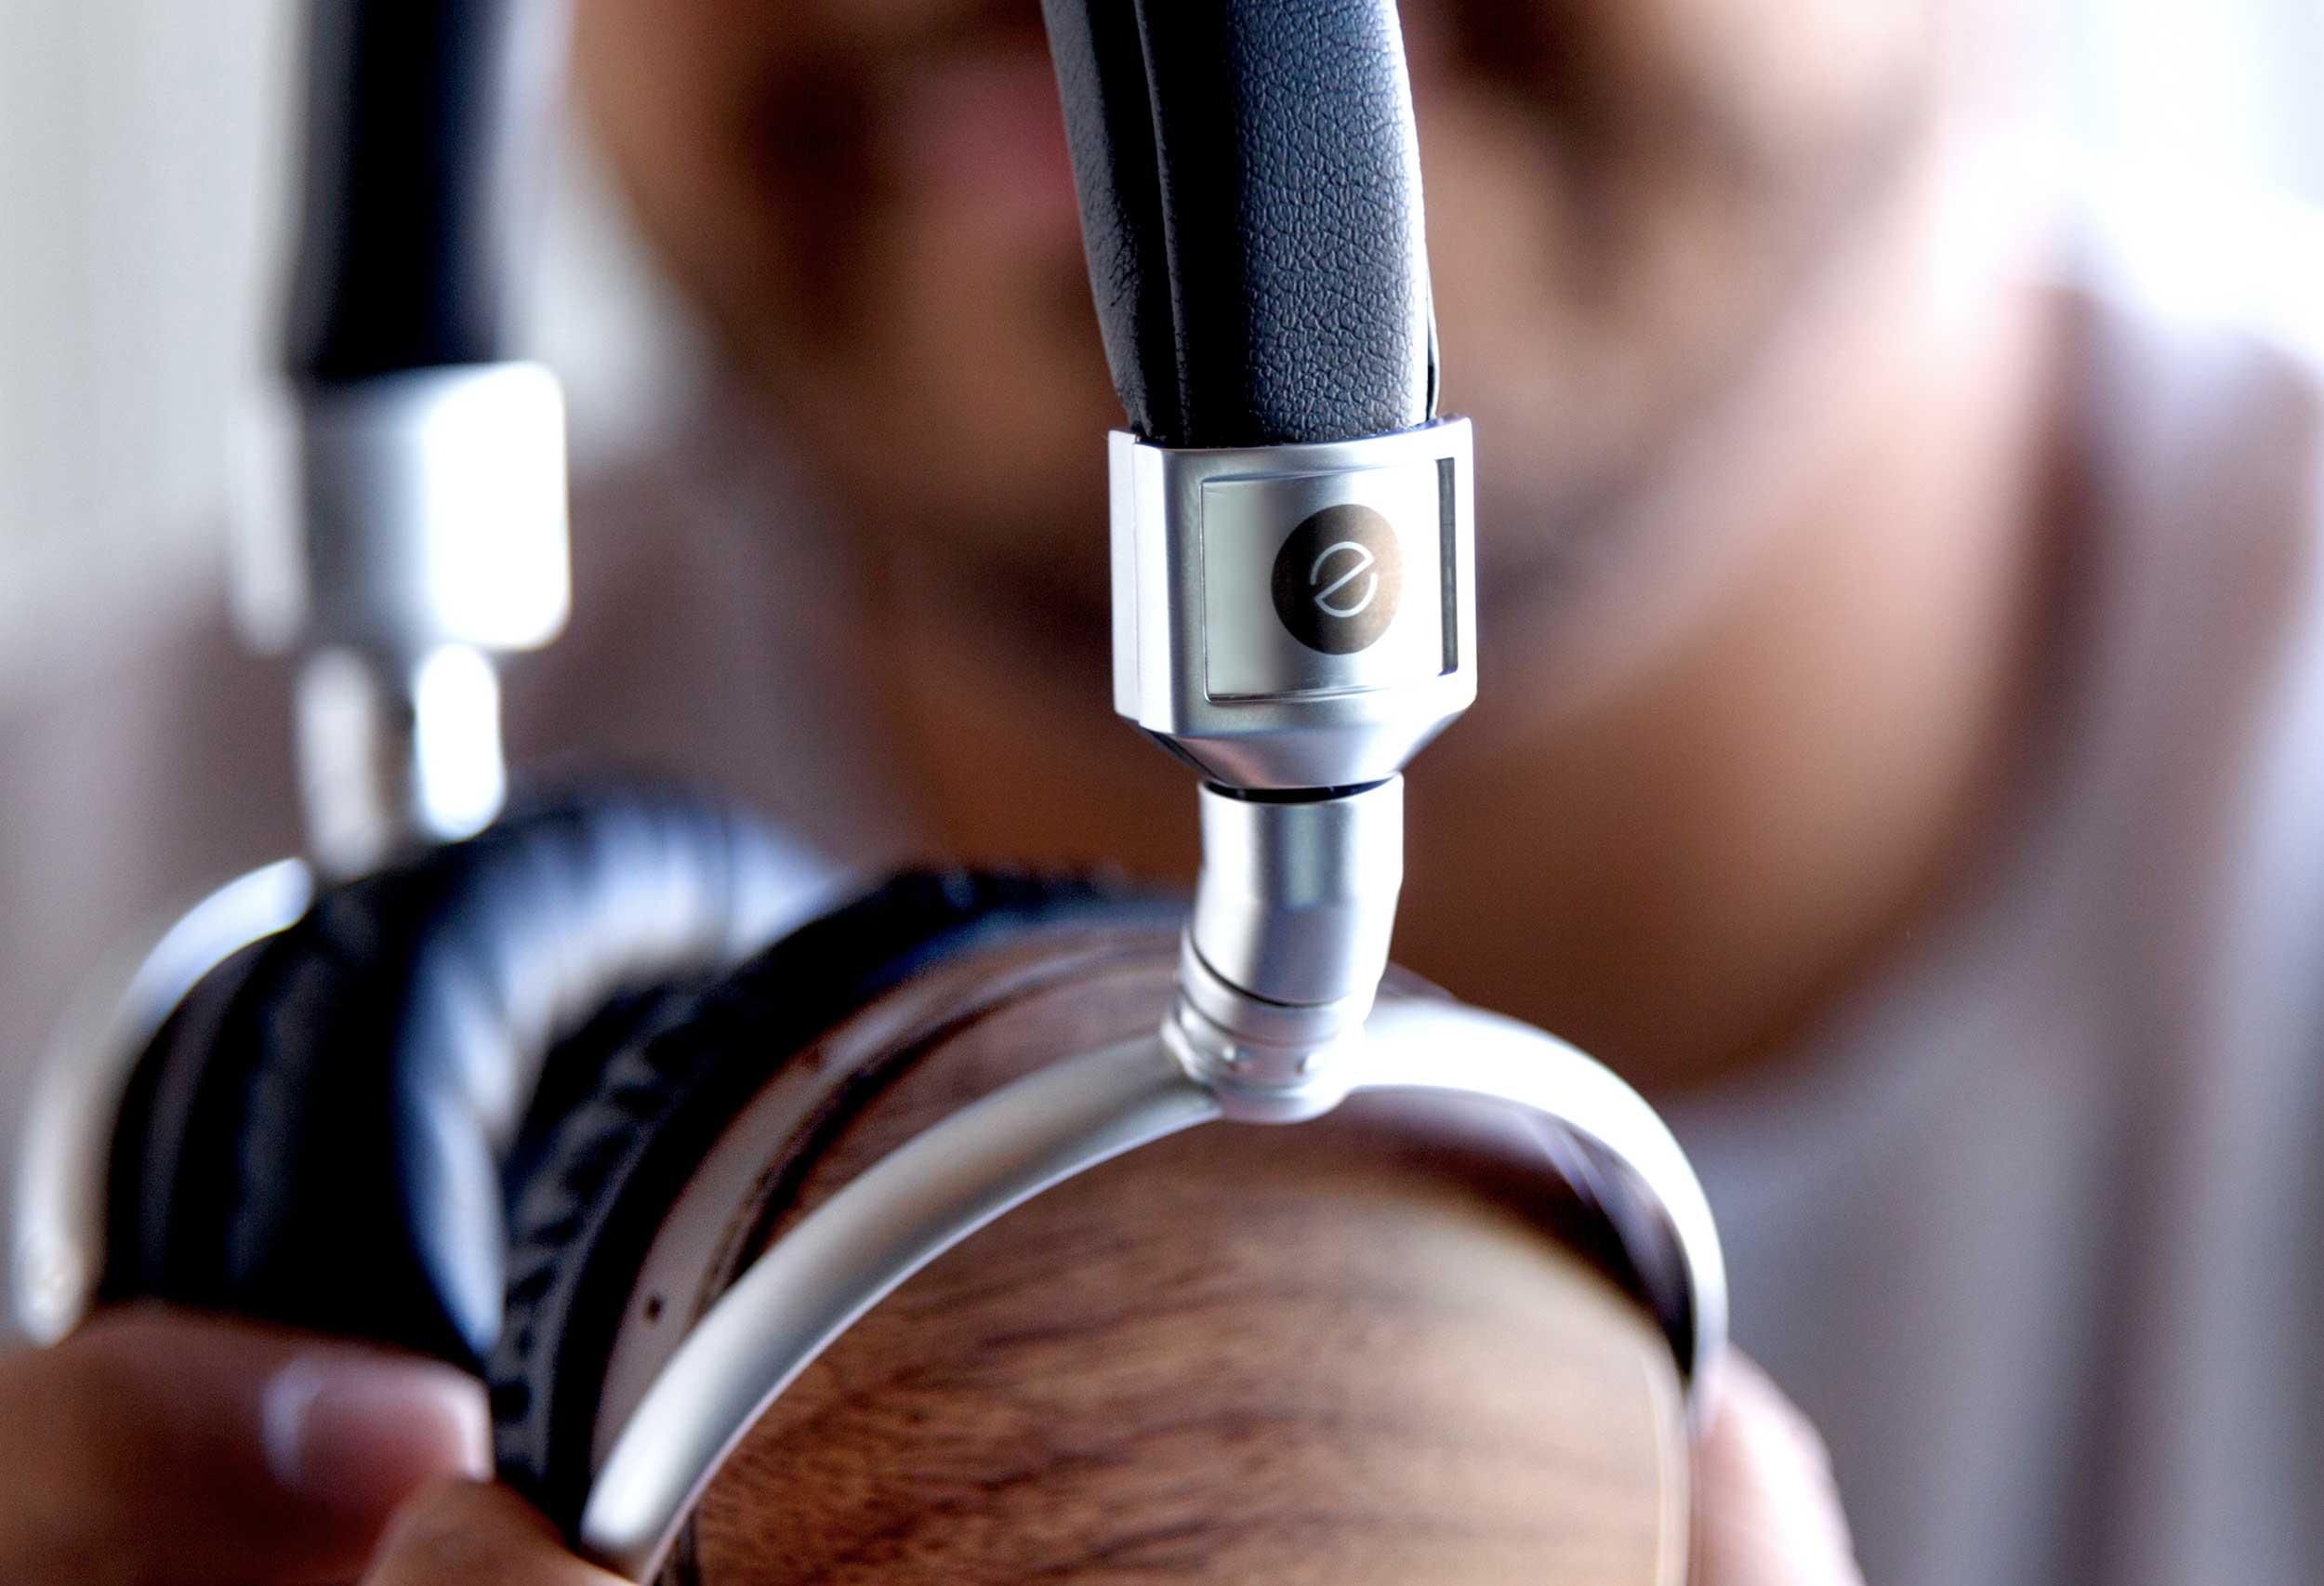 HeadphoneCloseup_JMichaelTuckerPhotography.jpg